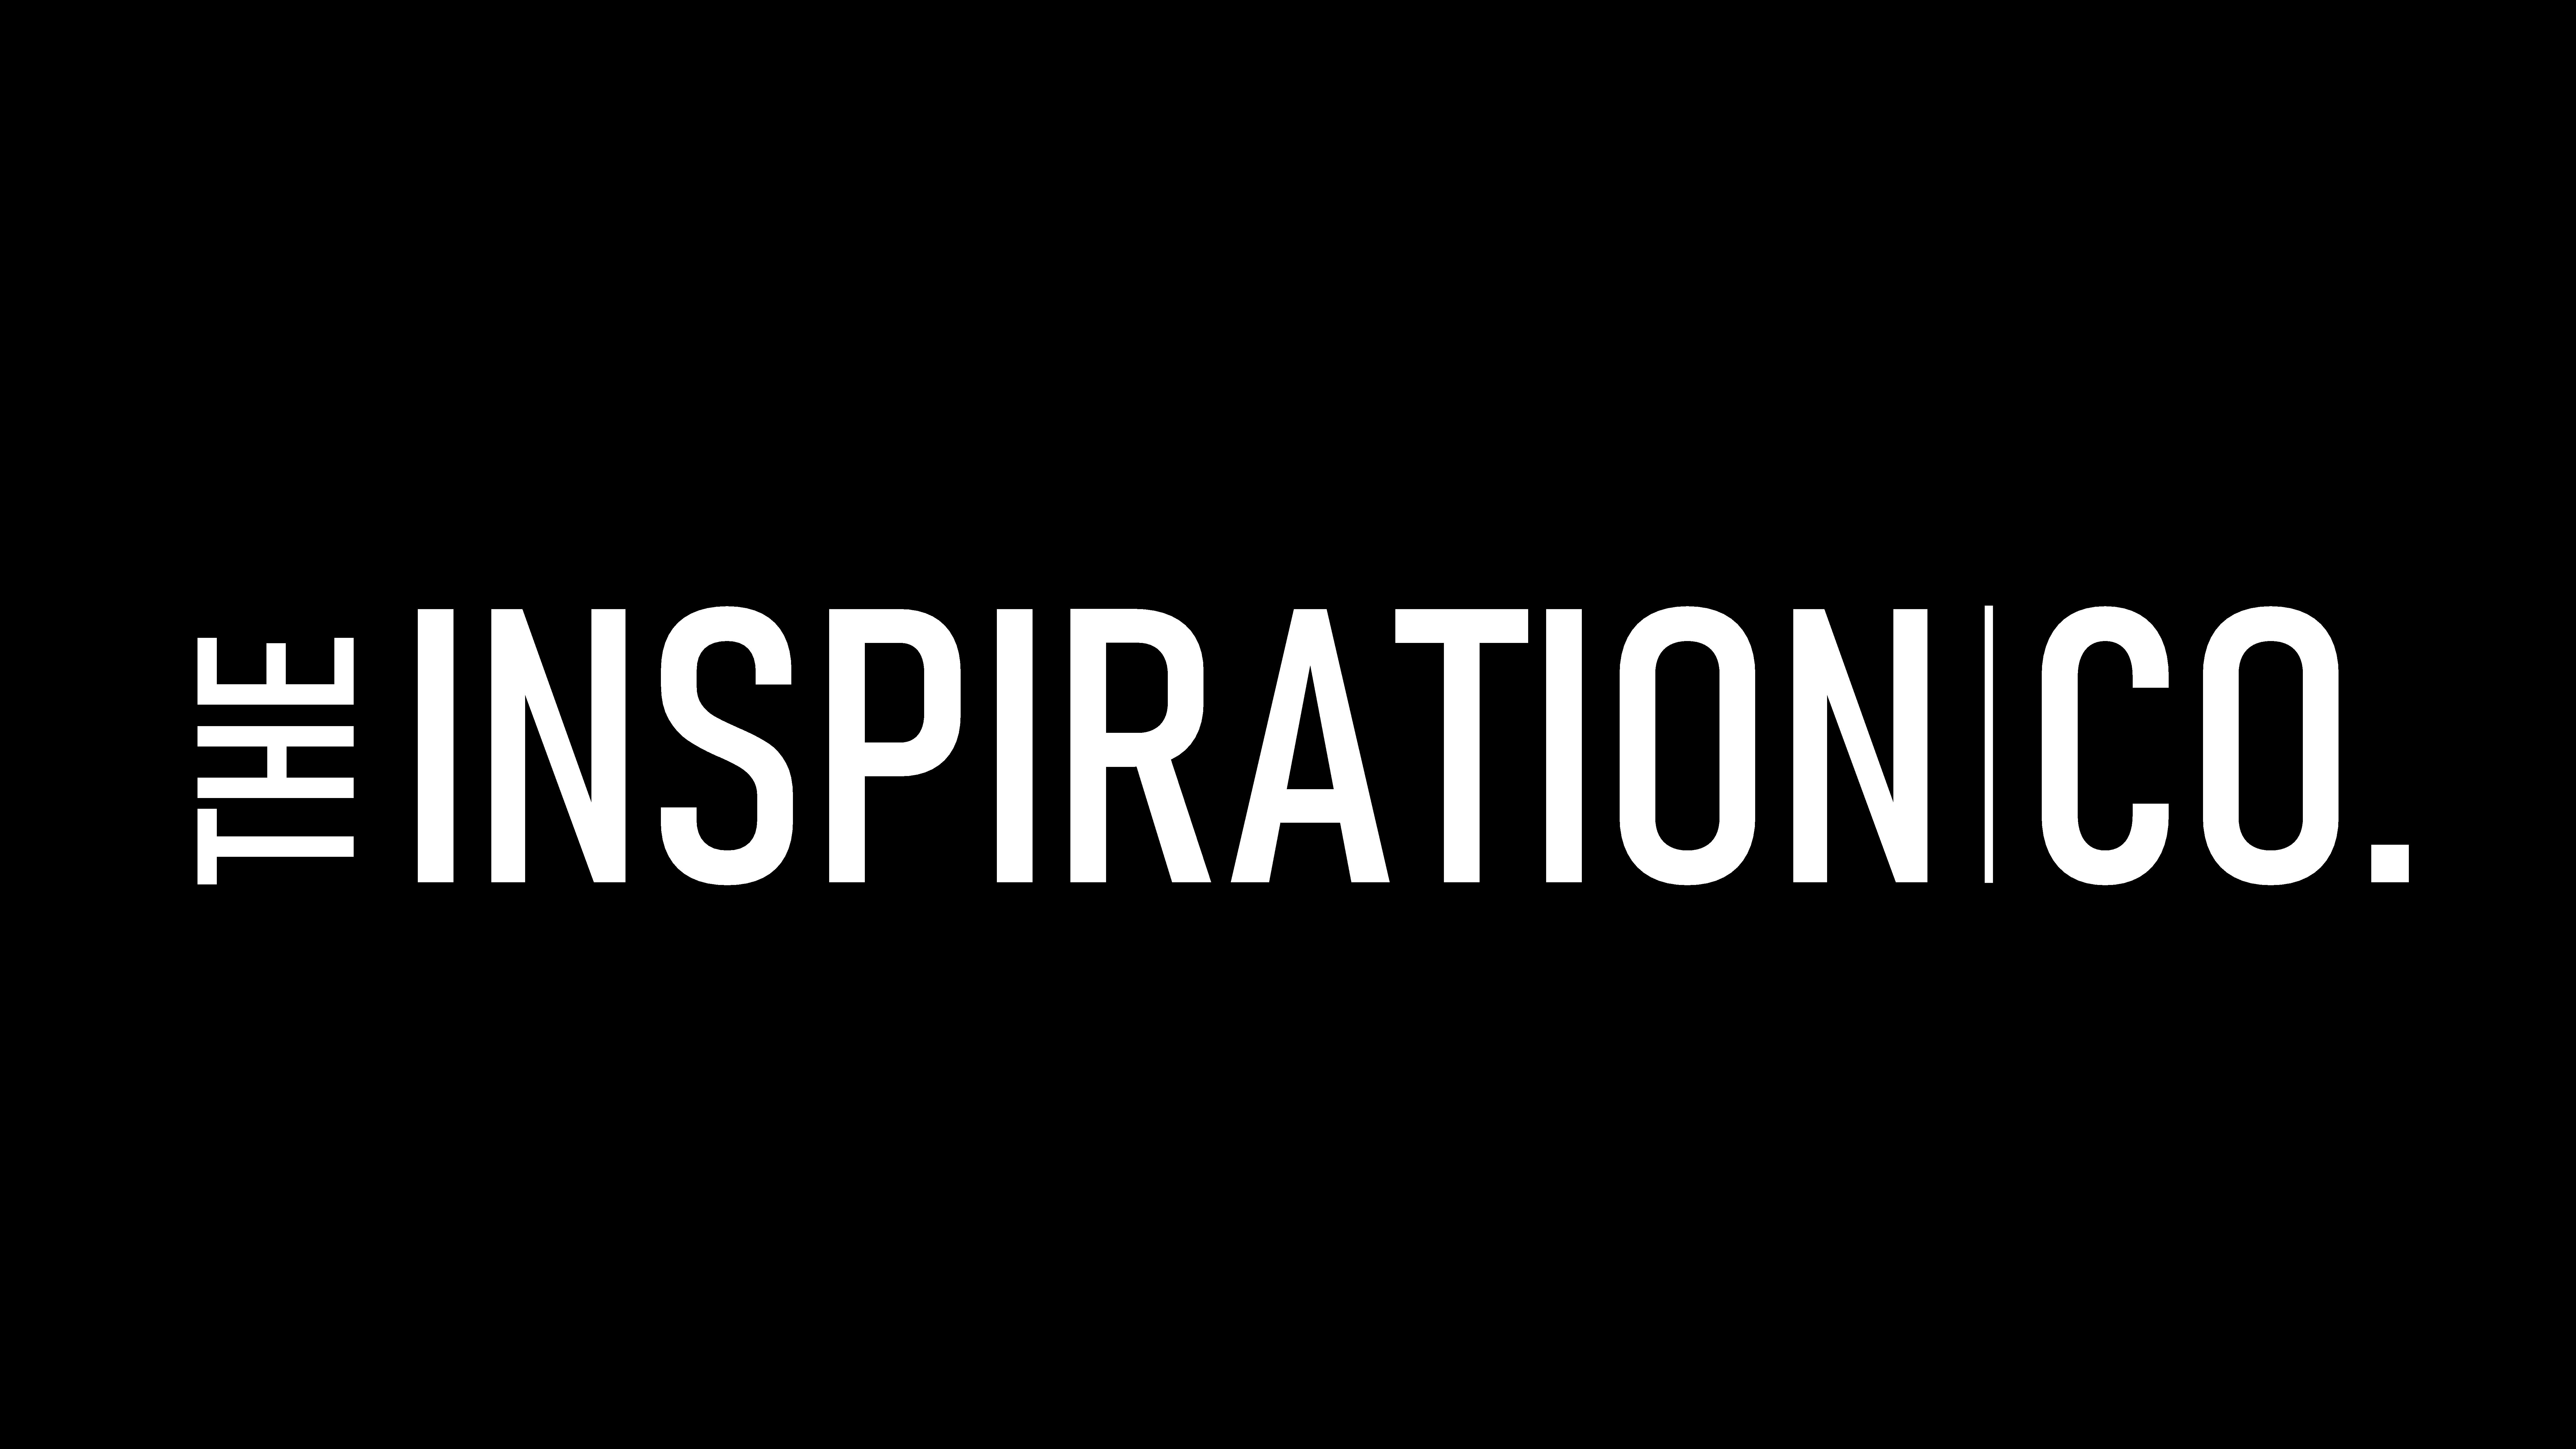 Inspiration Co. Logo